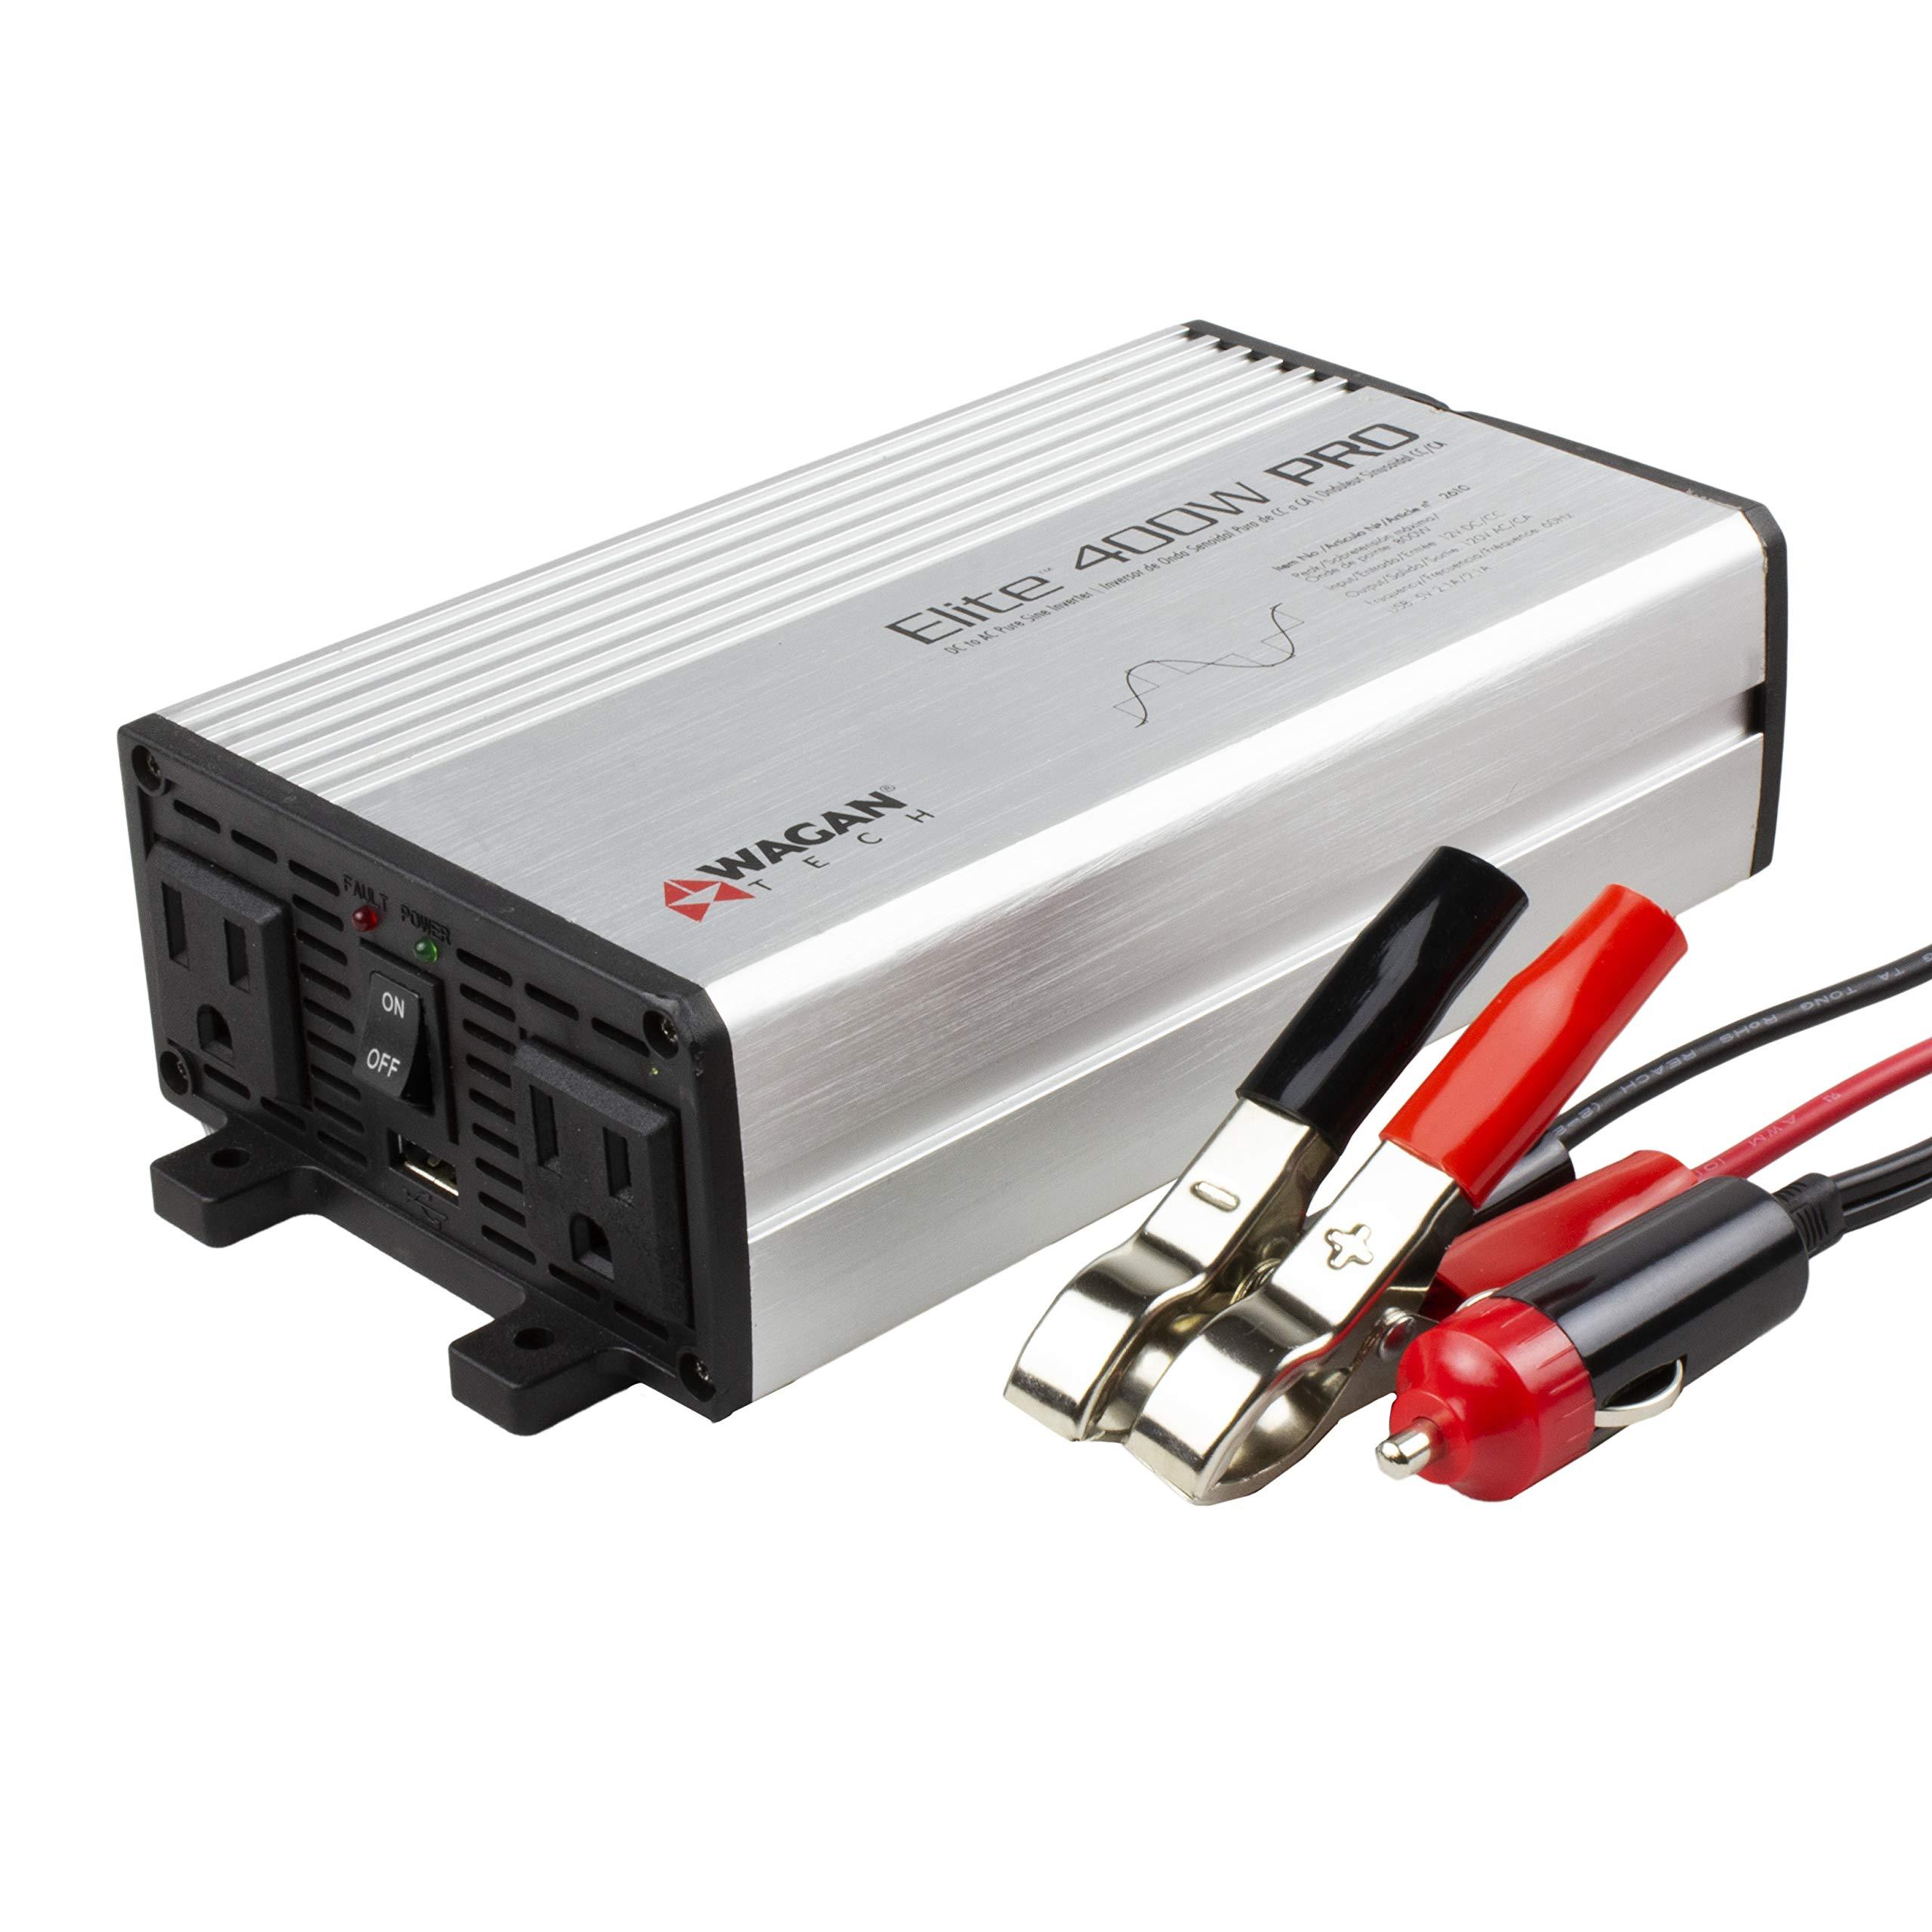 ELITE 400W PRO PSW Pure Sine Wave Power Inverter